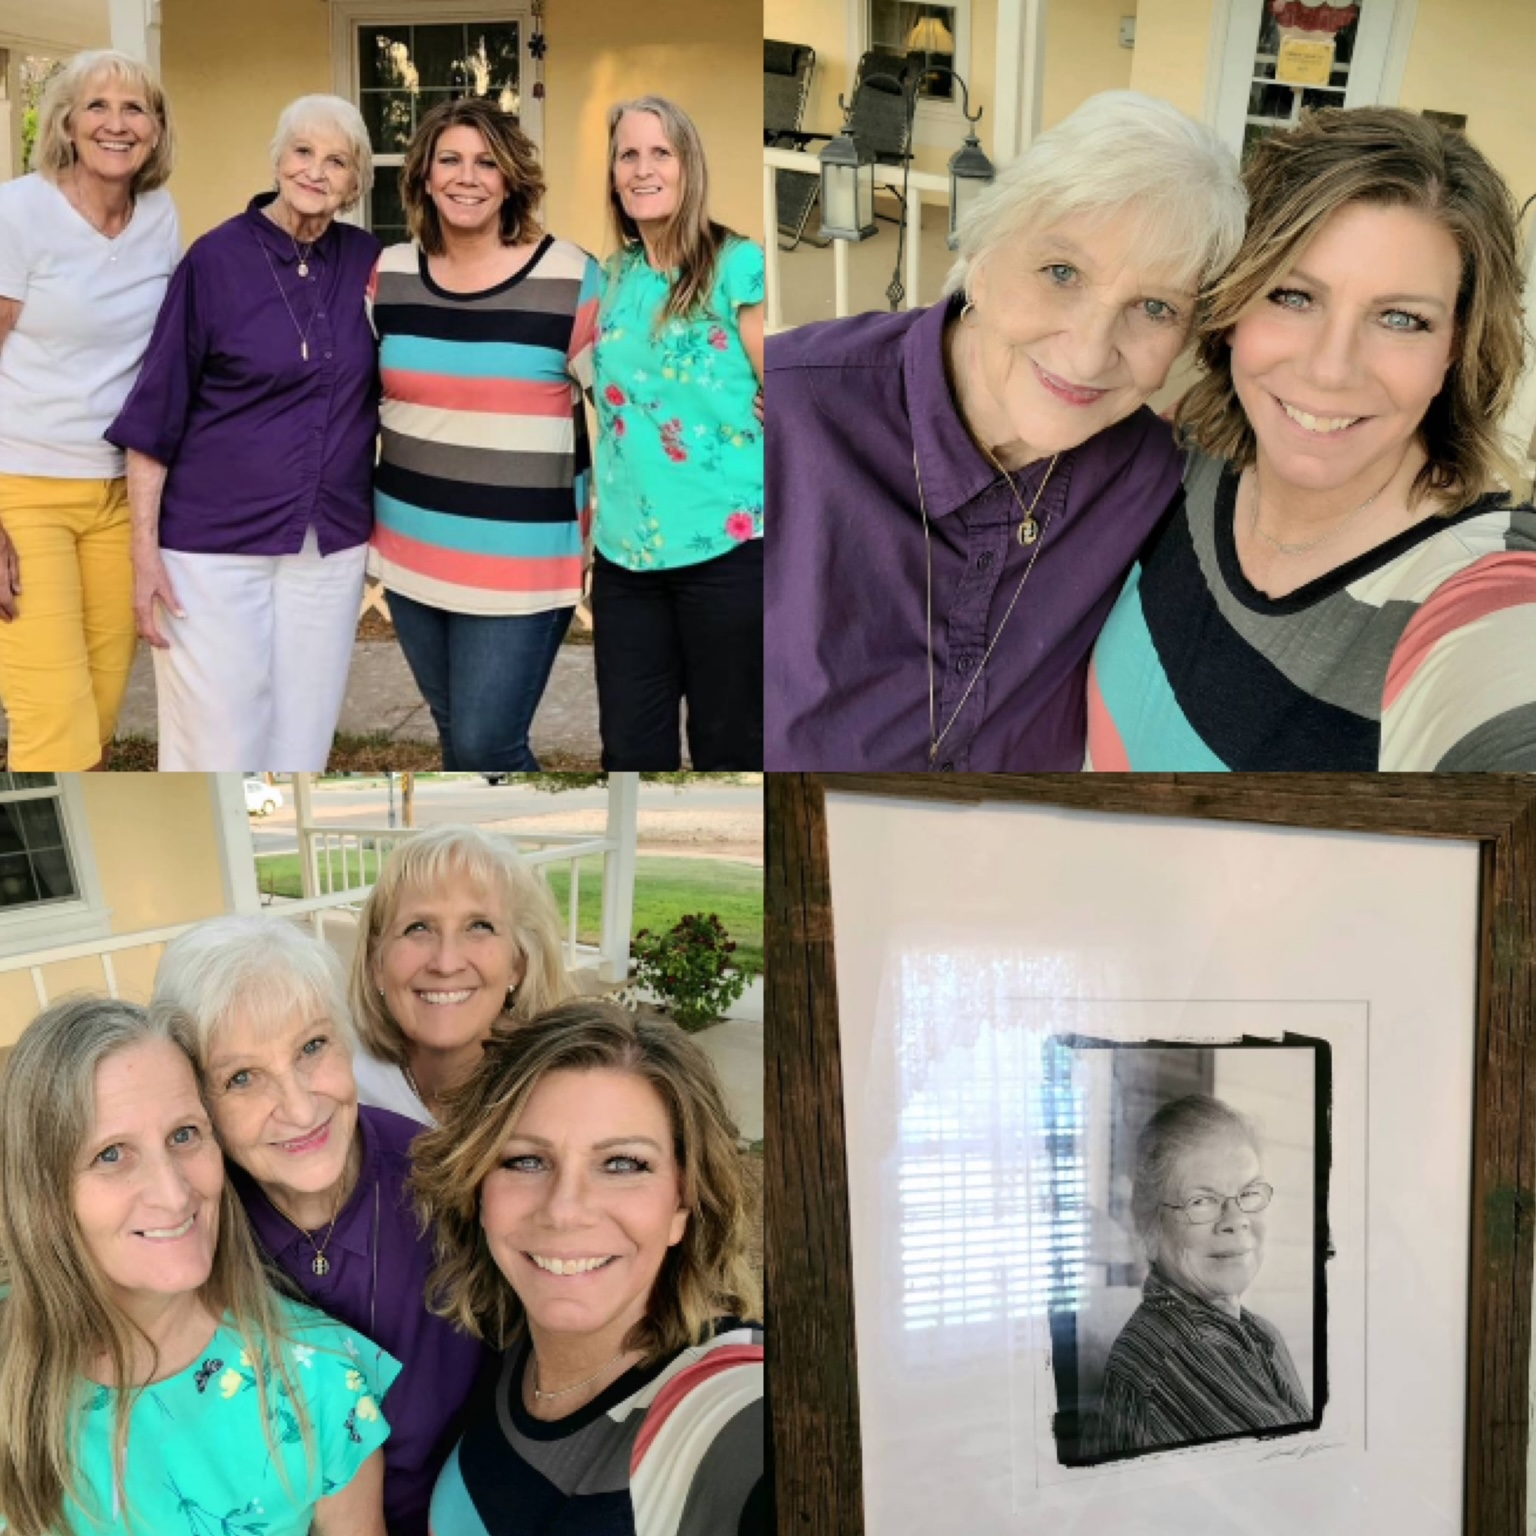 Sister Wives Credit: Meri Brown IG